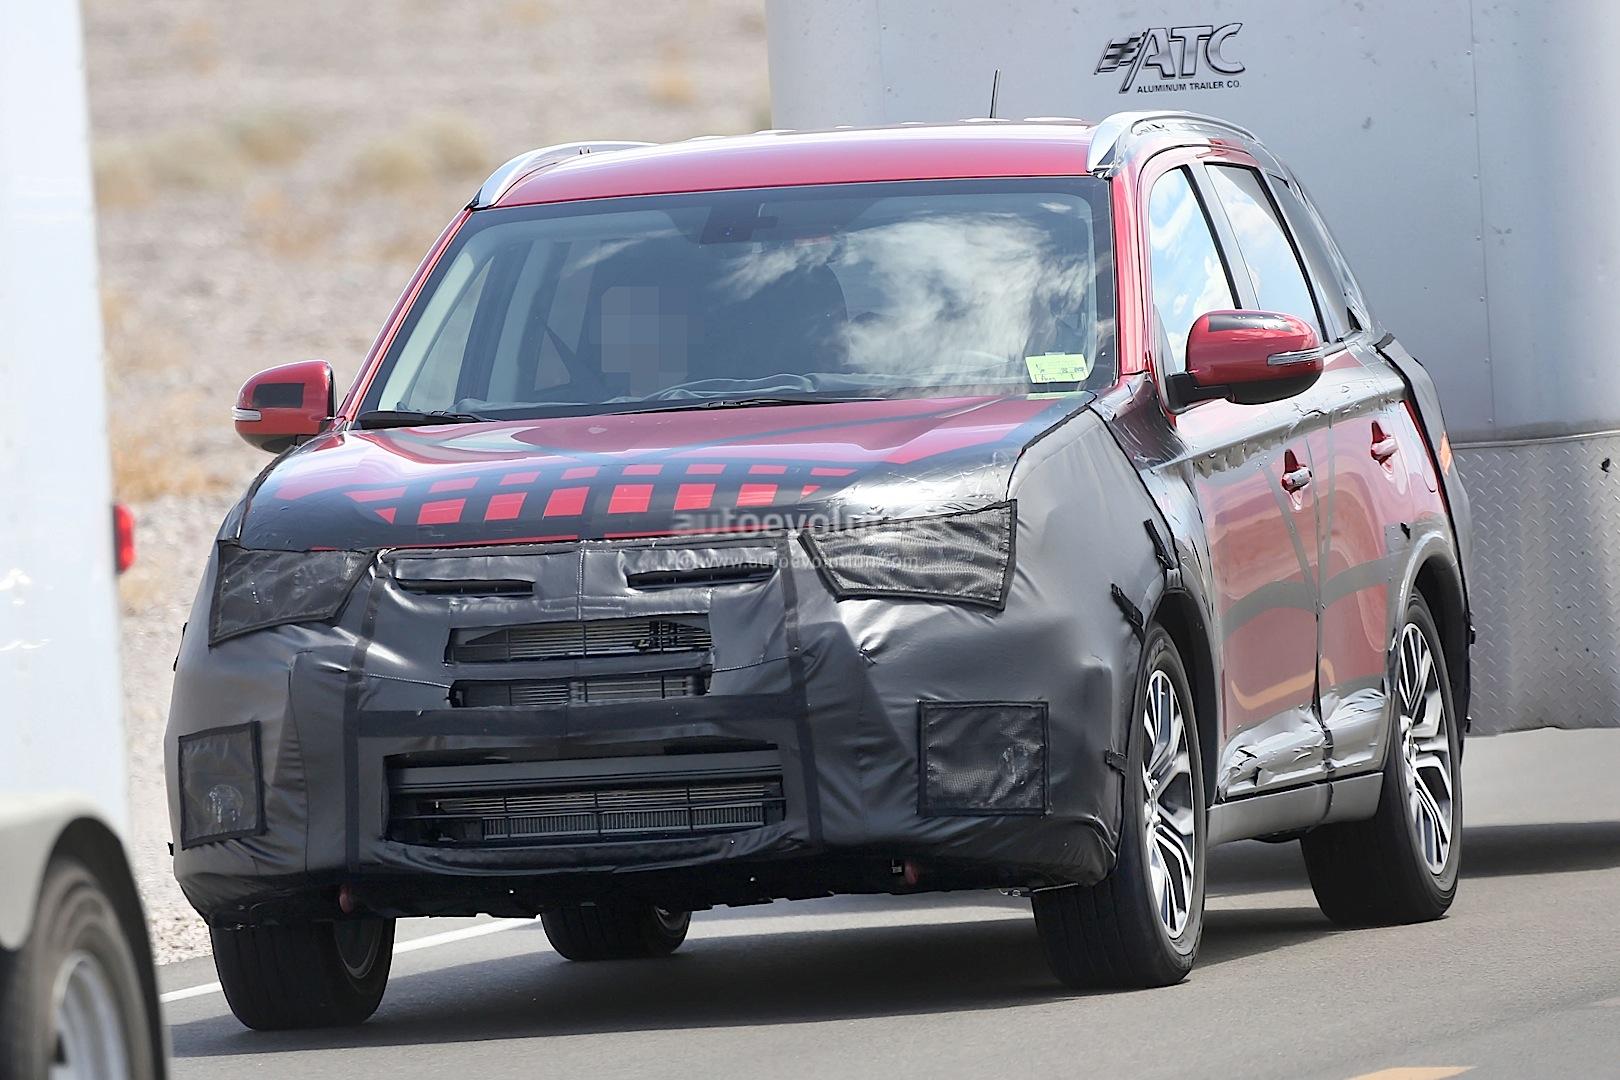 Mitsubishi Electric Car >> 2015 Mitsubishi Outlander Facelift Spied Towing a Trailer - autoevolution